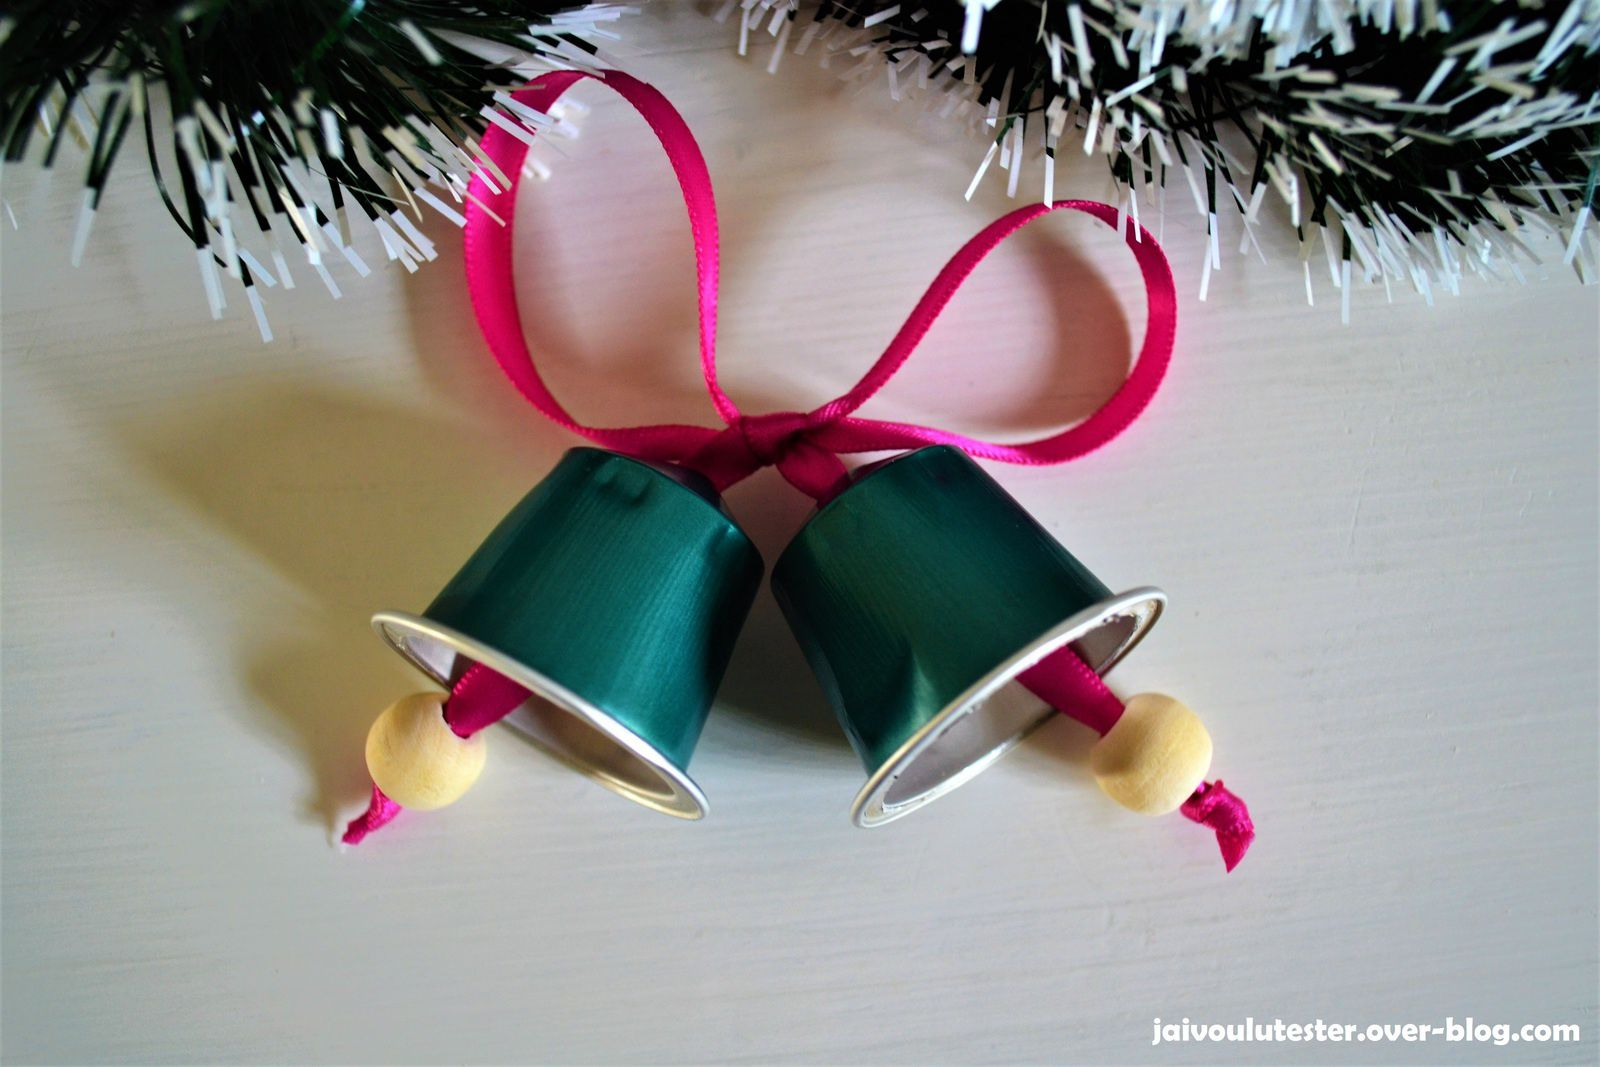 ... le DIY spécial Noël (#7): upcycling capsules de café